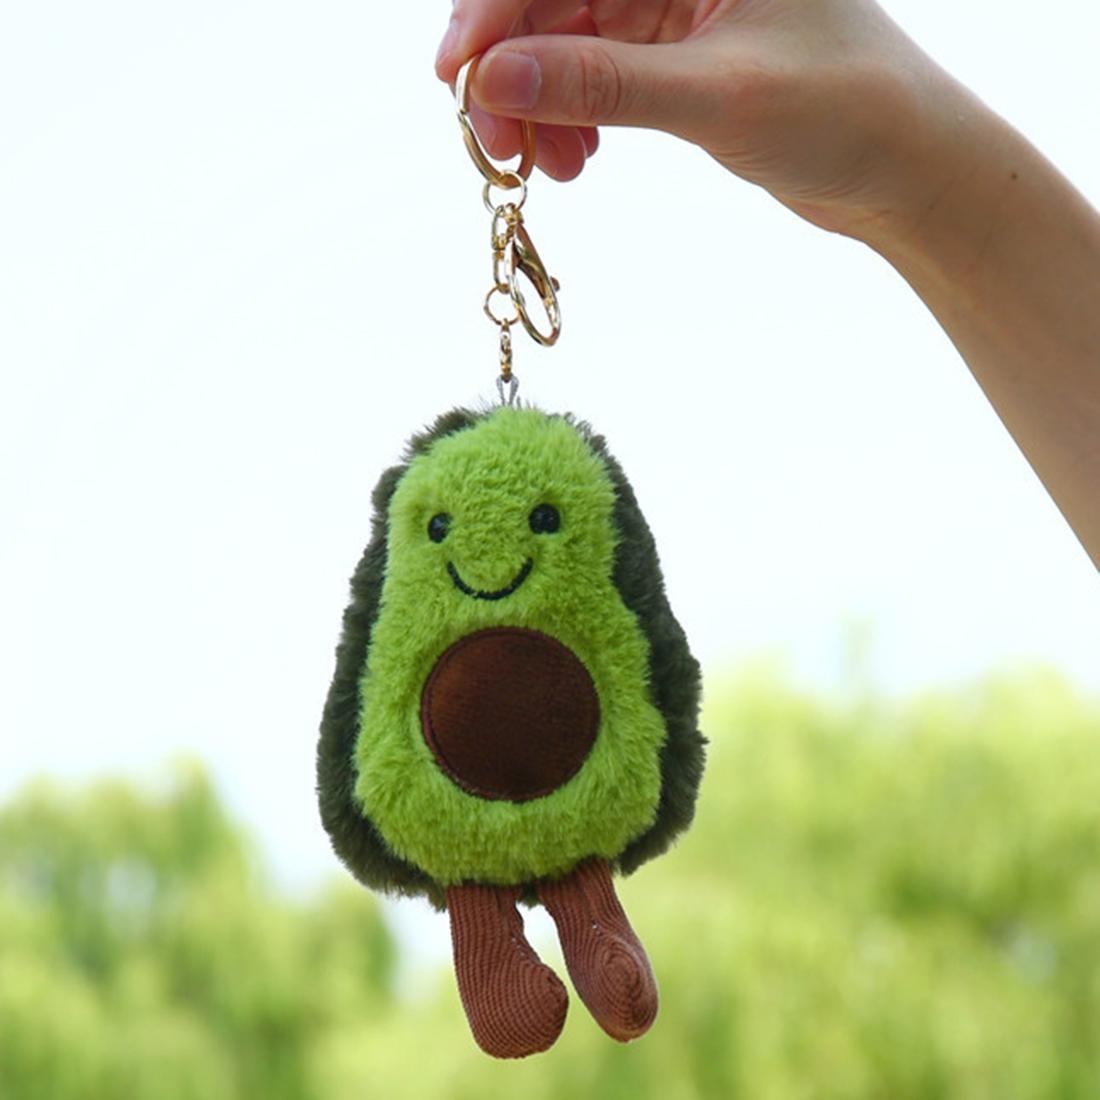 Cute Fruit Jewelry Plush Cartoon Anthropomorphic Avocado Key Ring